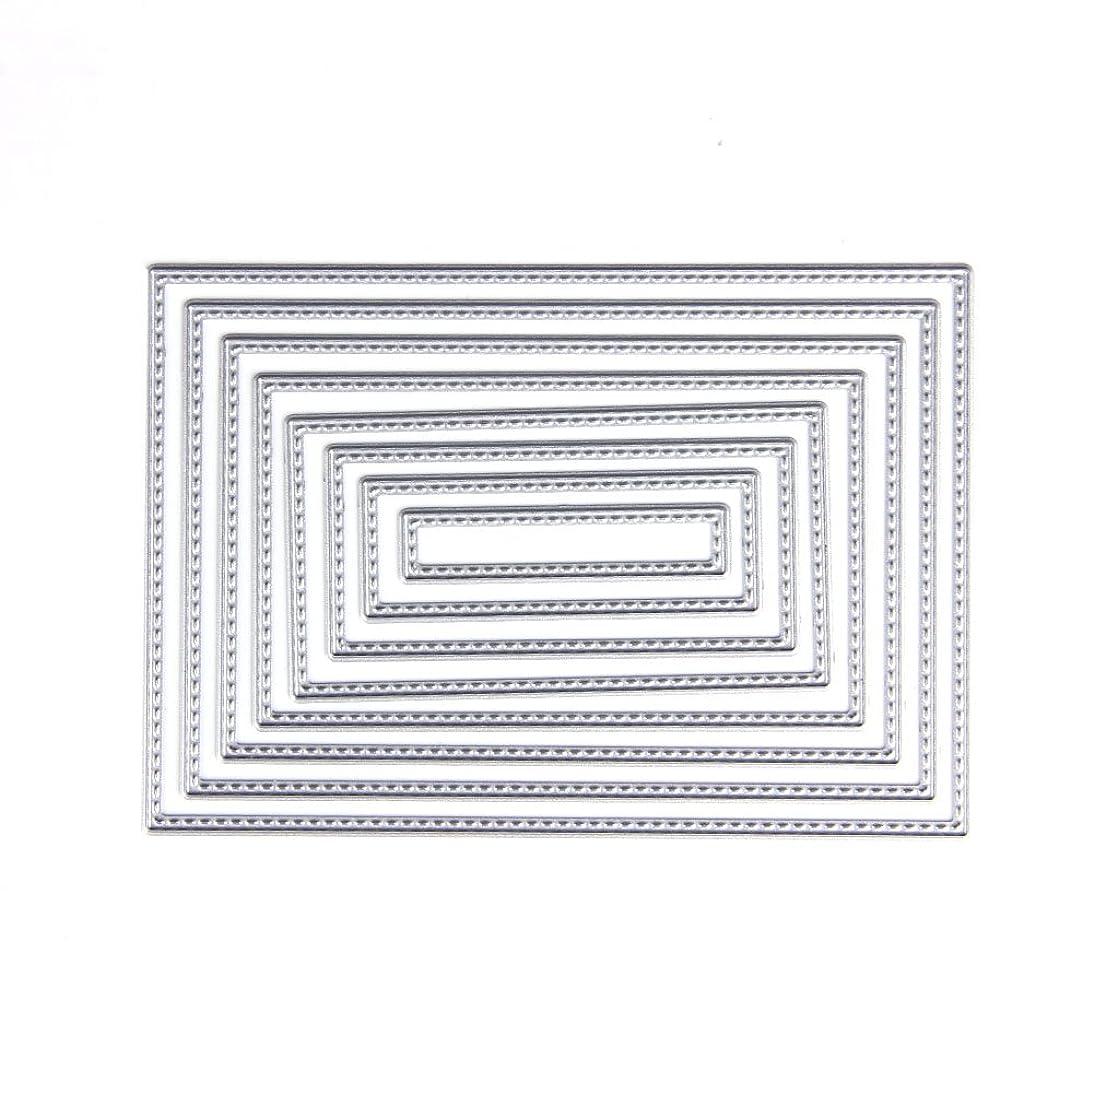 Hunulu 8pcs Rectangle Cutting Dies Stencil DIY Scrapbooking Album Card Embossing Craft